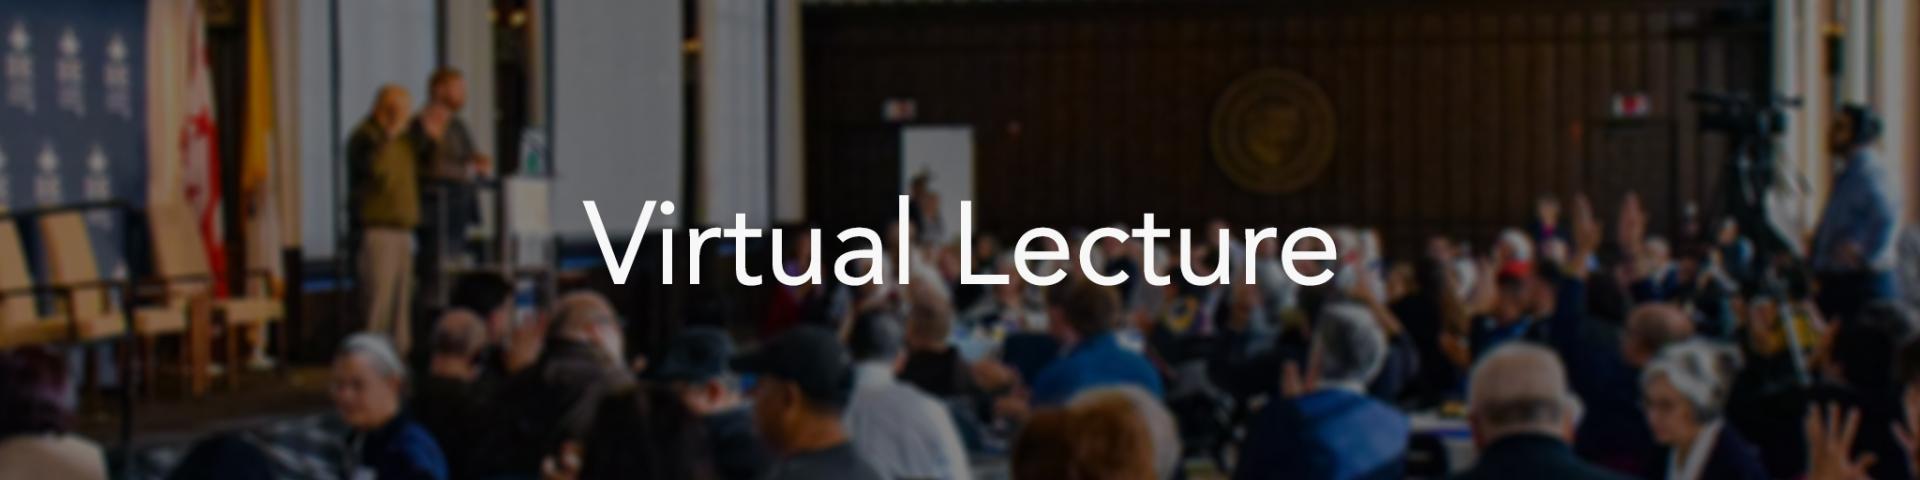 Virtual Lecture